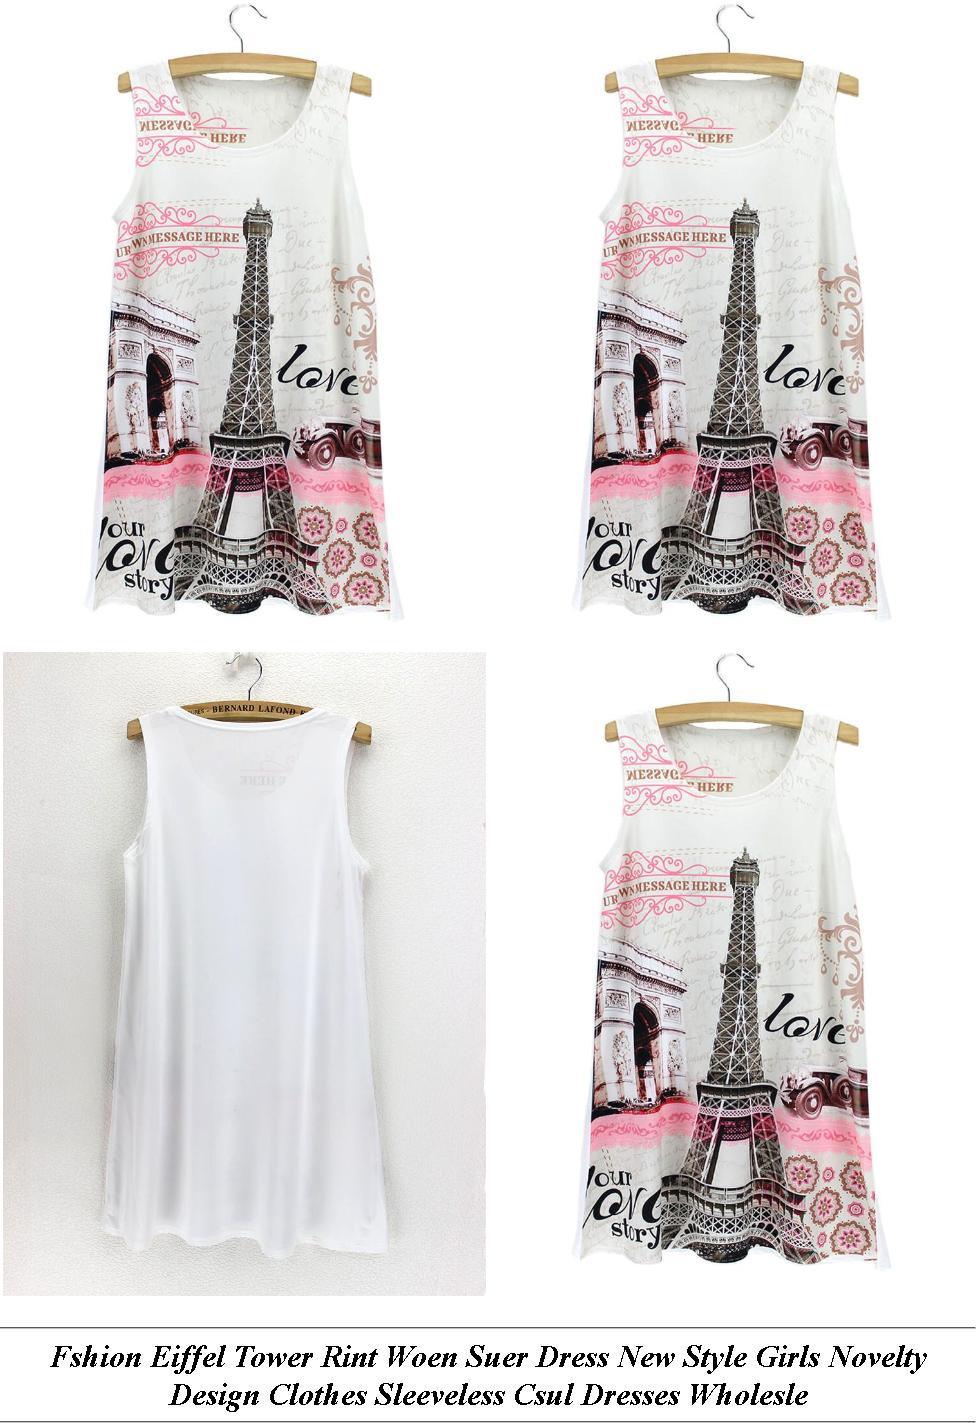 Semi Formal Dresses For Women - Womens Clearance Sale - Shirt Dress - Cheap Designer Clothes Womens